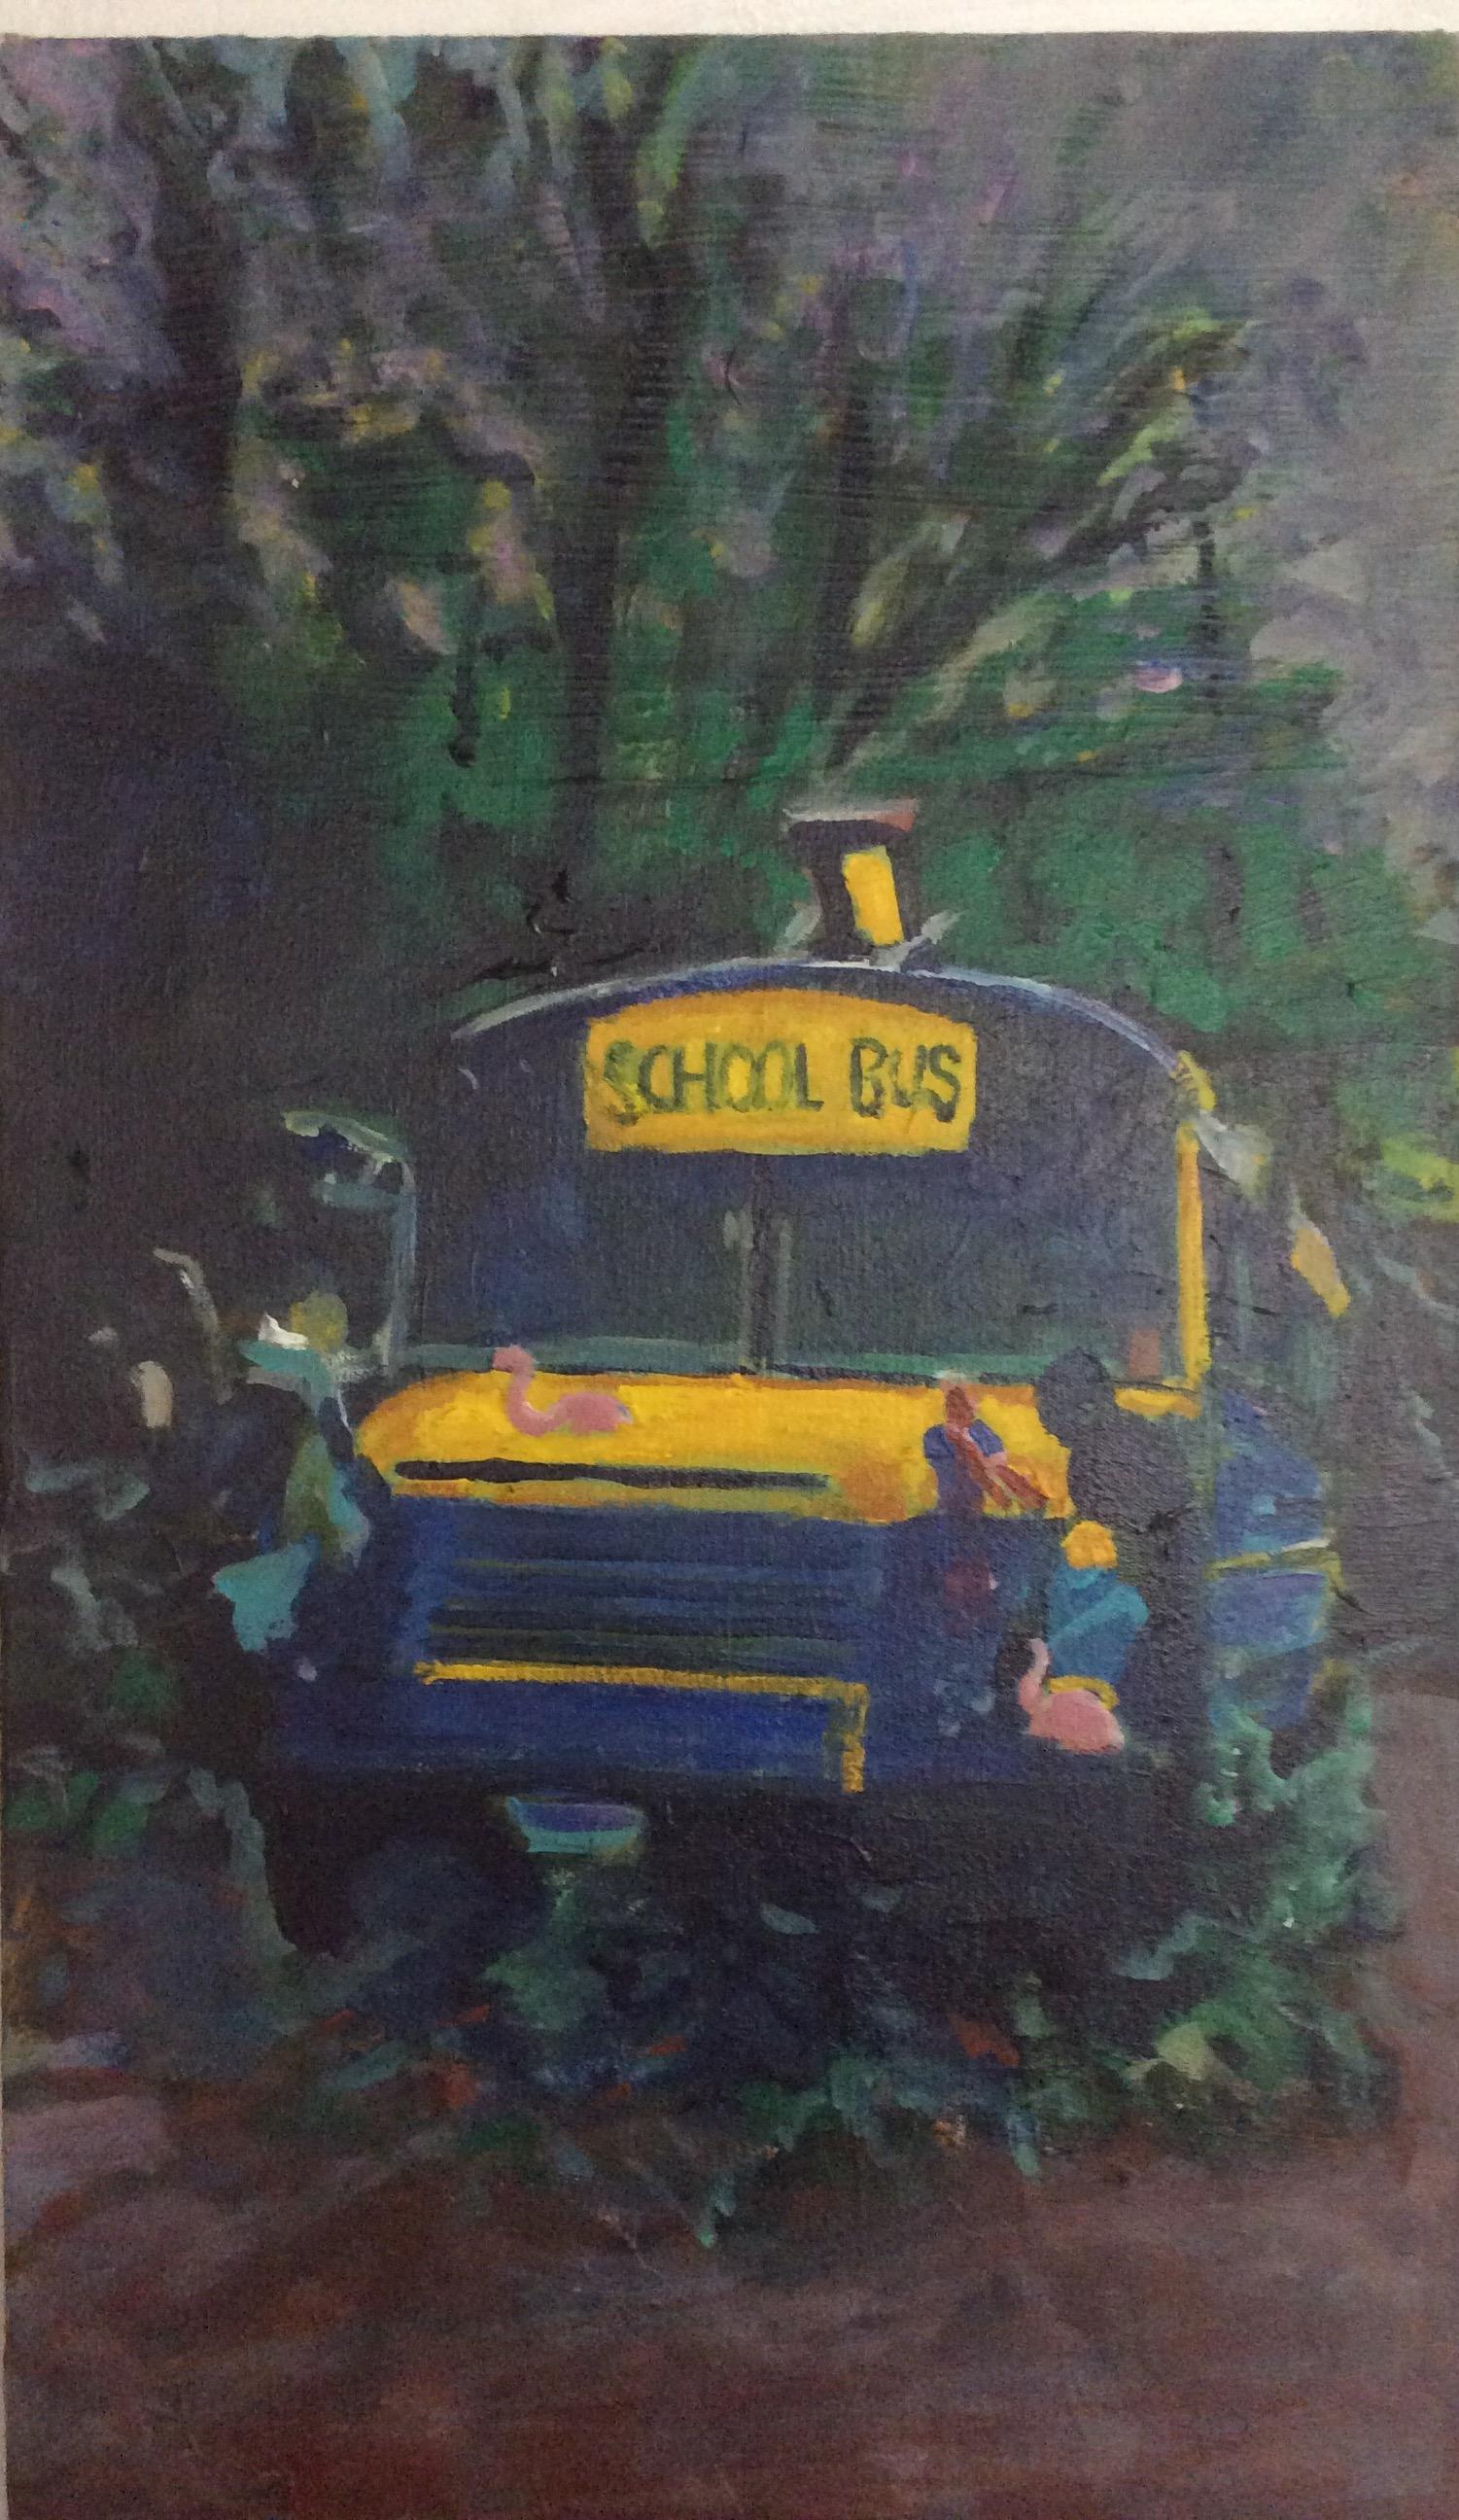 Hannah's school bus she rents through Airbnb